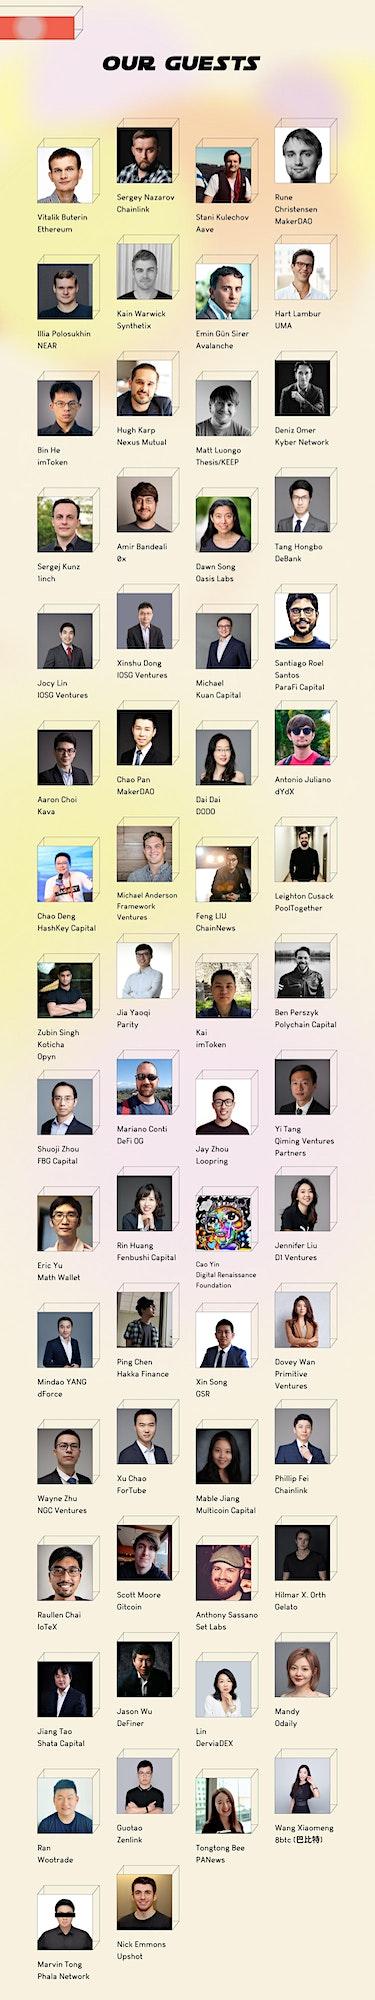 IOSG 7th Old Friends Reunion - DeFi Summit 2020 image